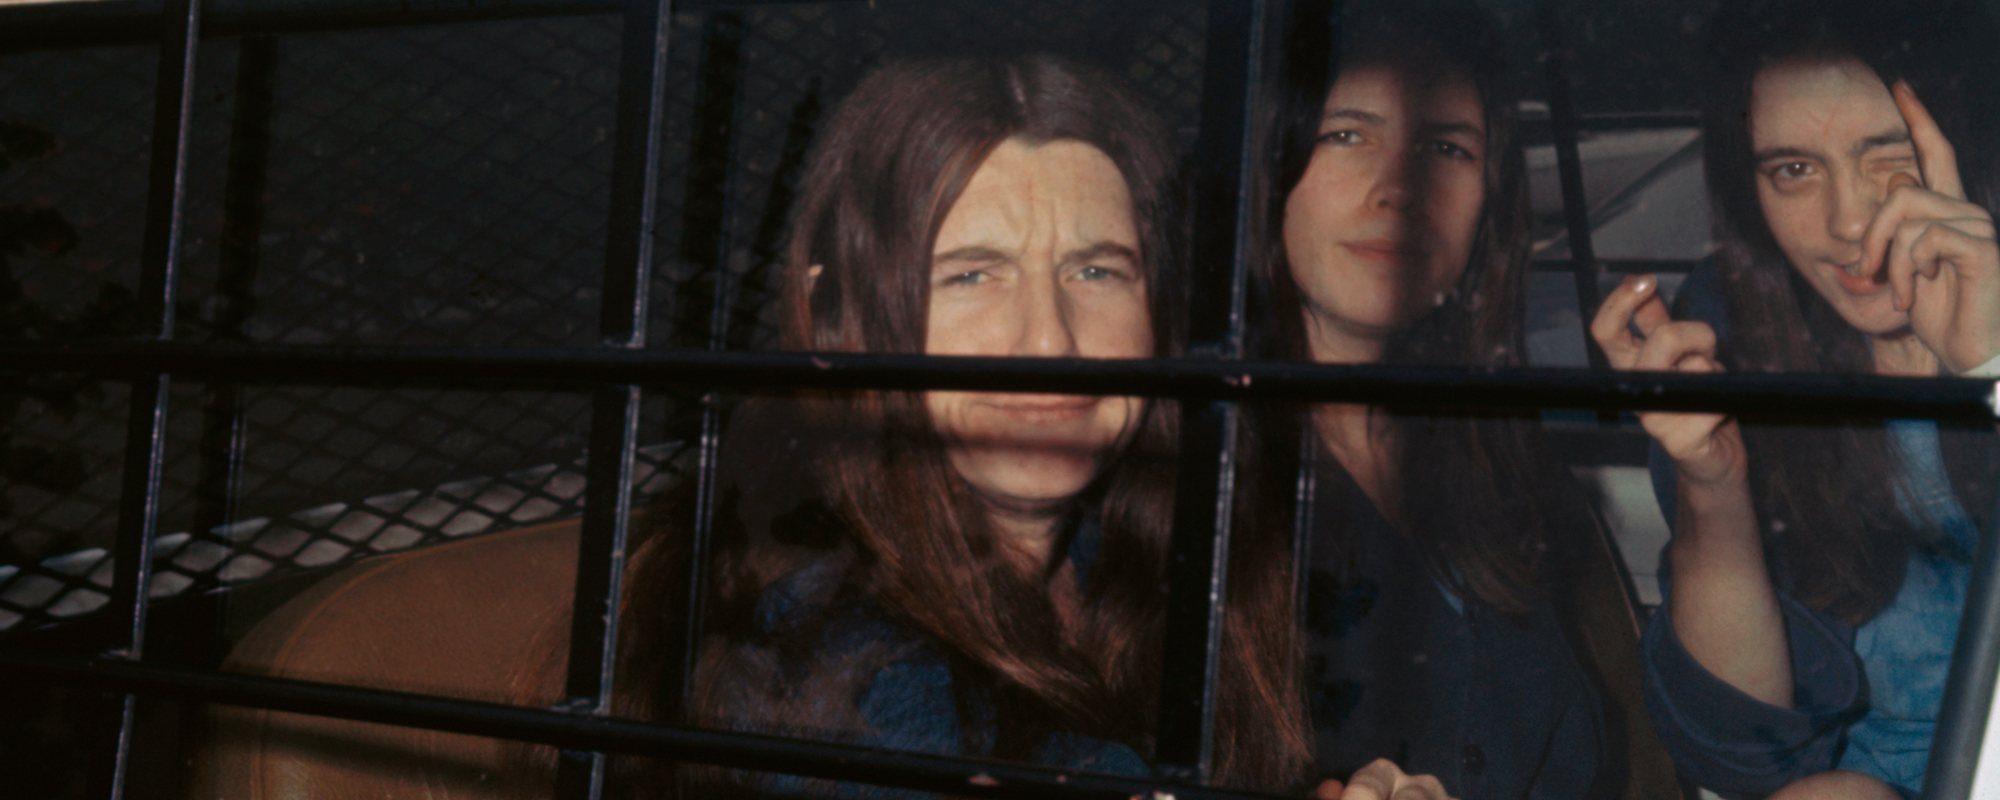 Patricia Krenwinkel: The Manson Girl Who Helped Kill Sharon Tate